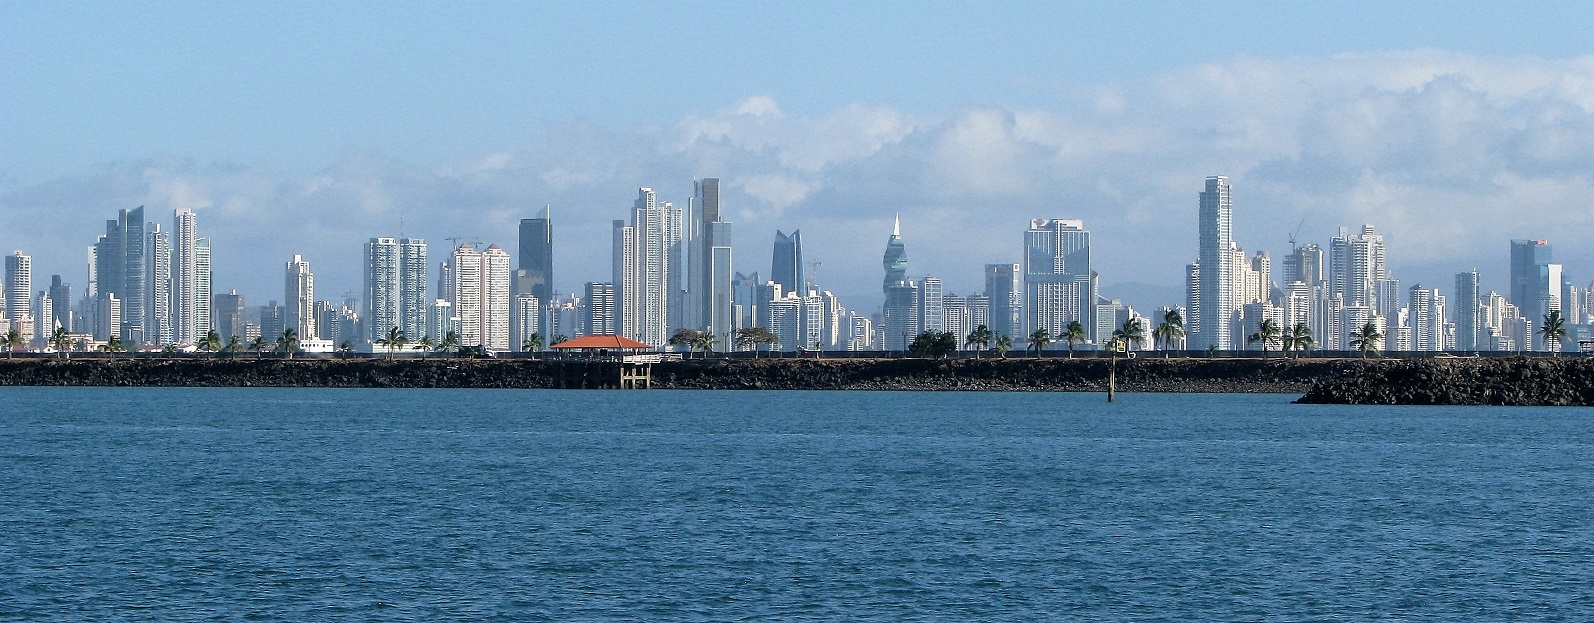 Skyline, Panama City